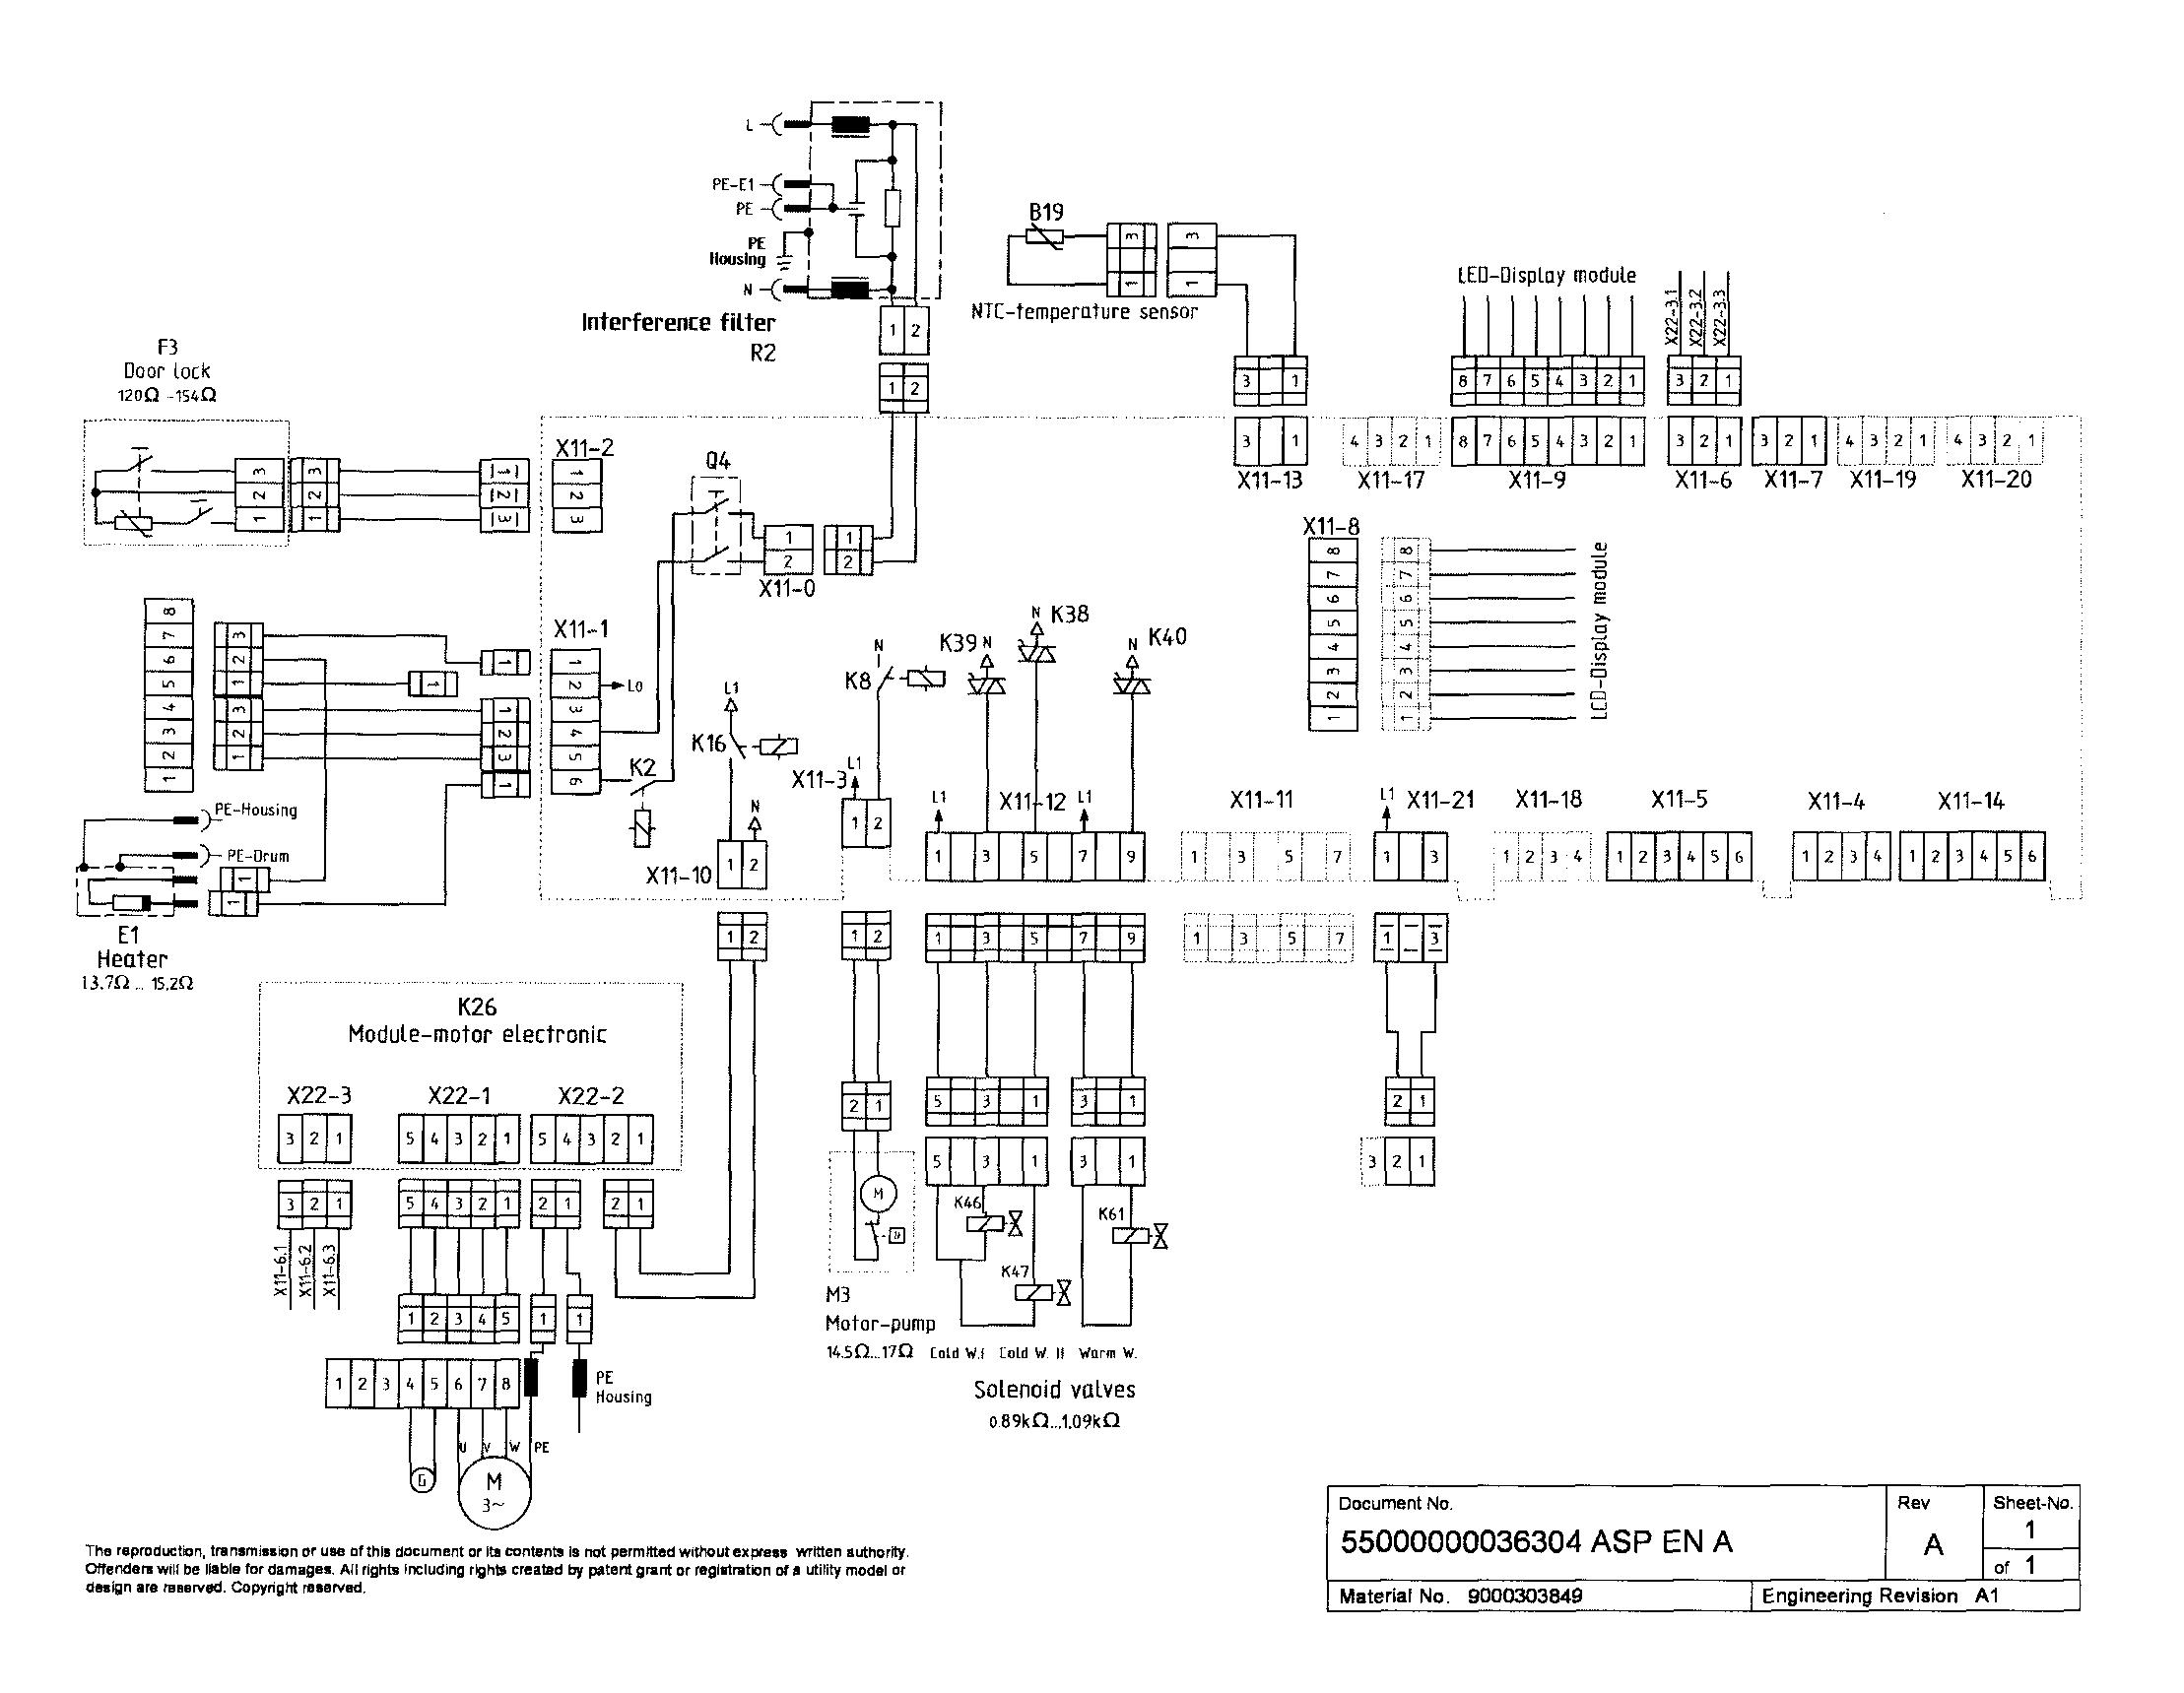 Bosch Washing Machine Motor Wiring Diagram - Wiring Samsung Diagram  Refrigerator Rb217a - 1991rx7.yenpancane.jeanjaures37.frWiring Diagram Resource